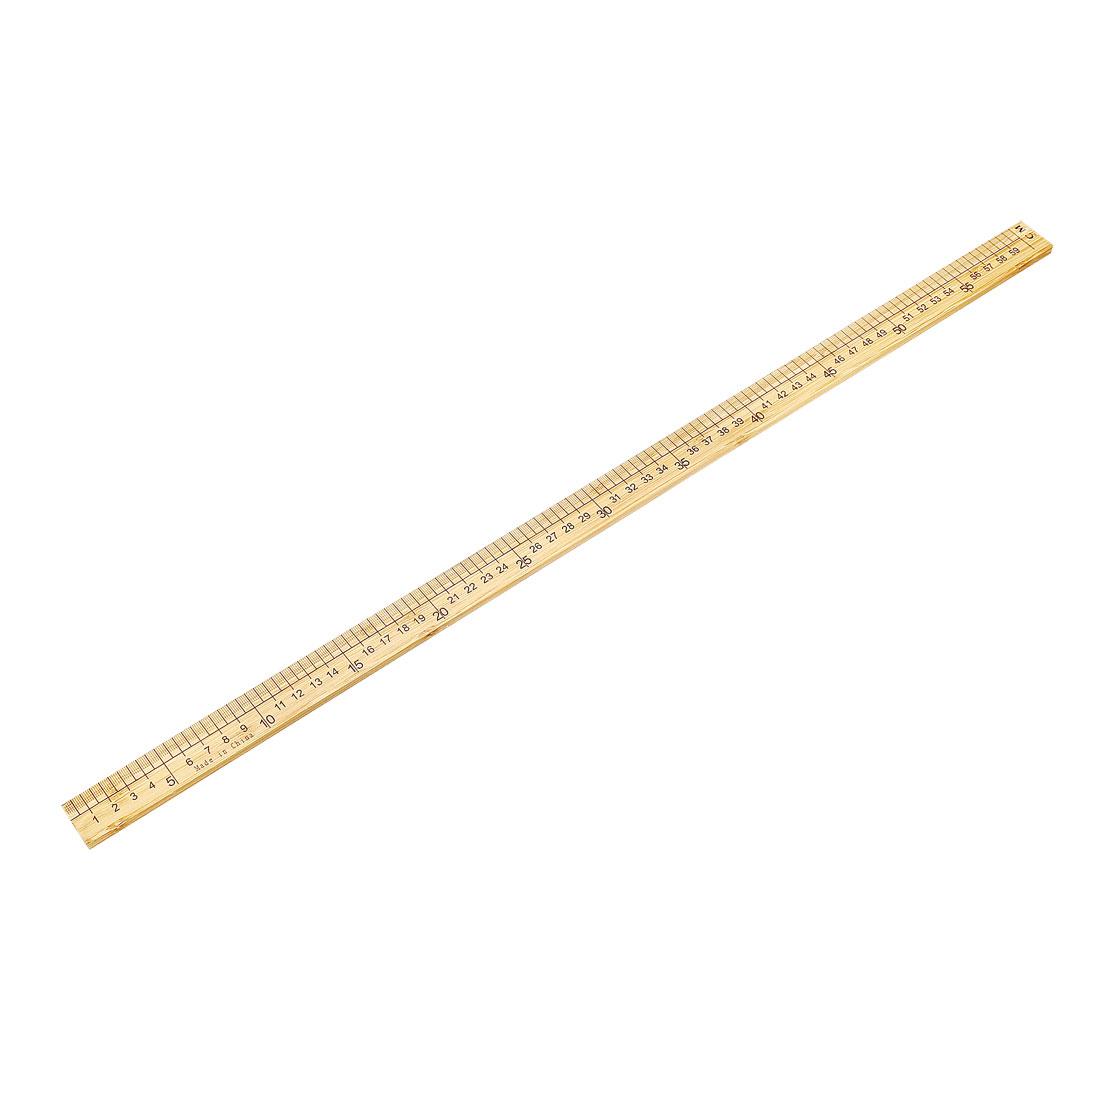 Straight Ruler 600mm 24 Inch Metric Measuring Tool Wood